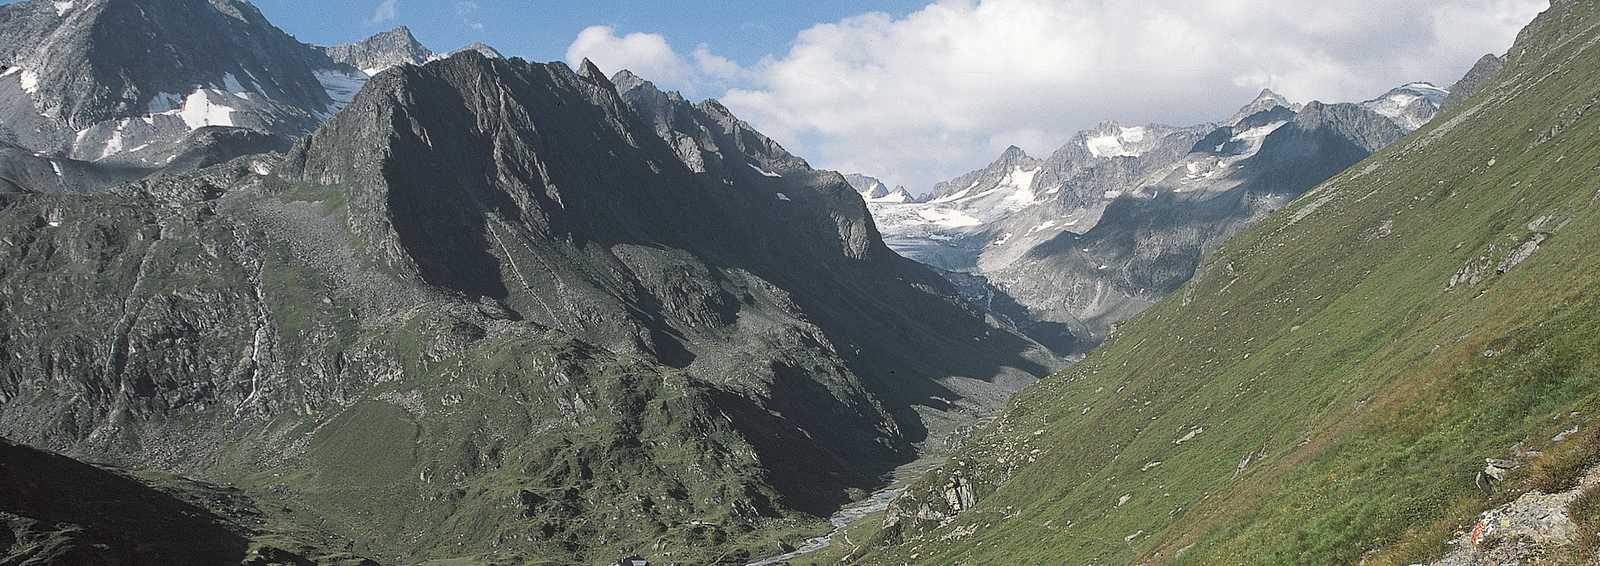 Trekking in the Tyrol, Austia